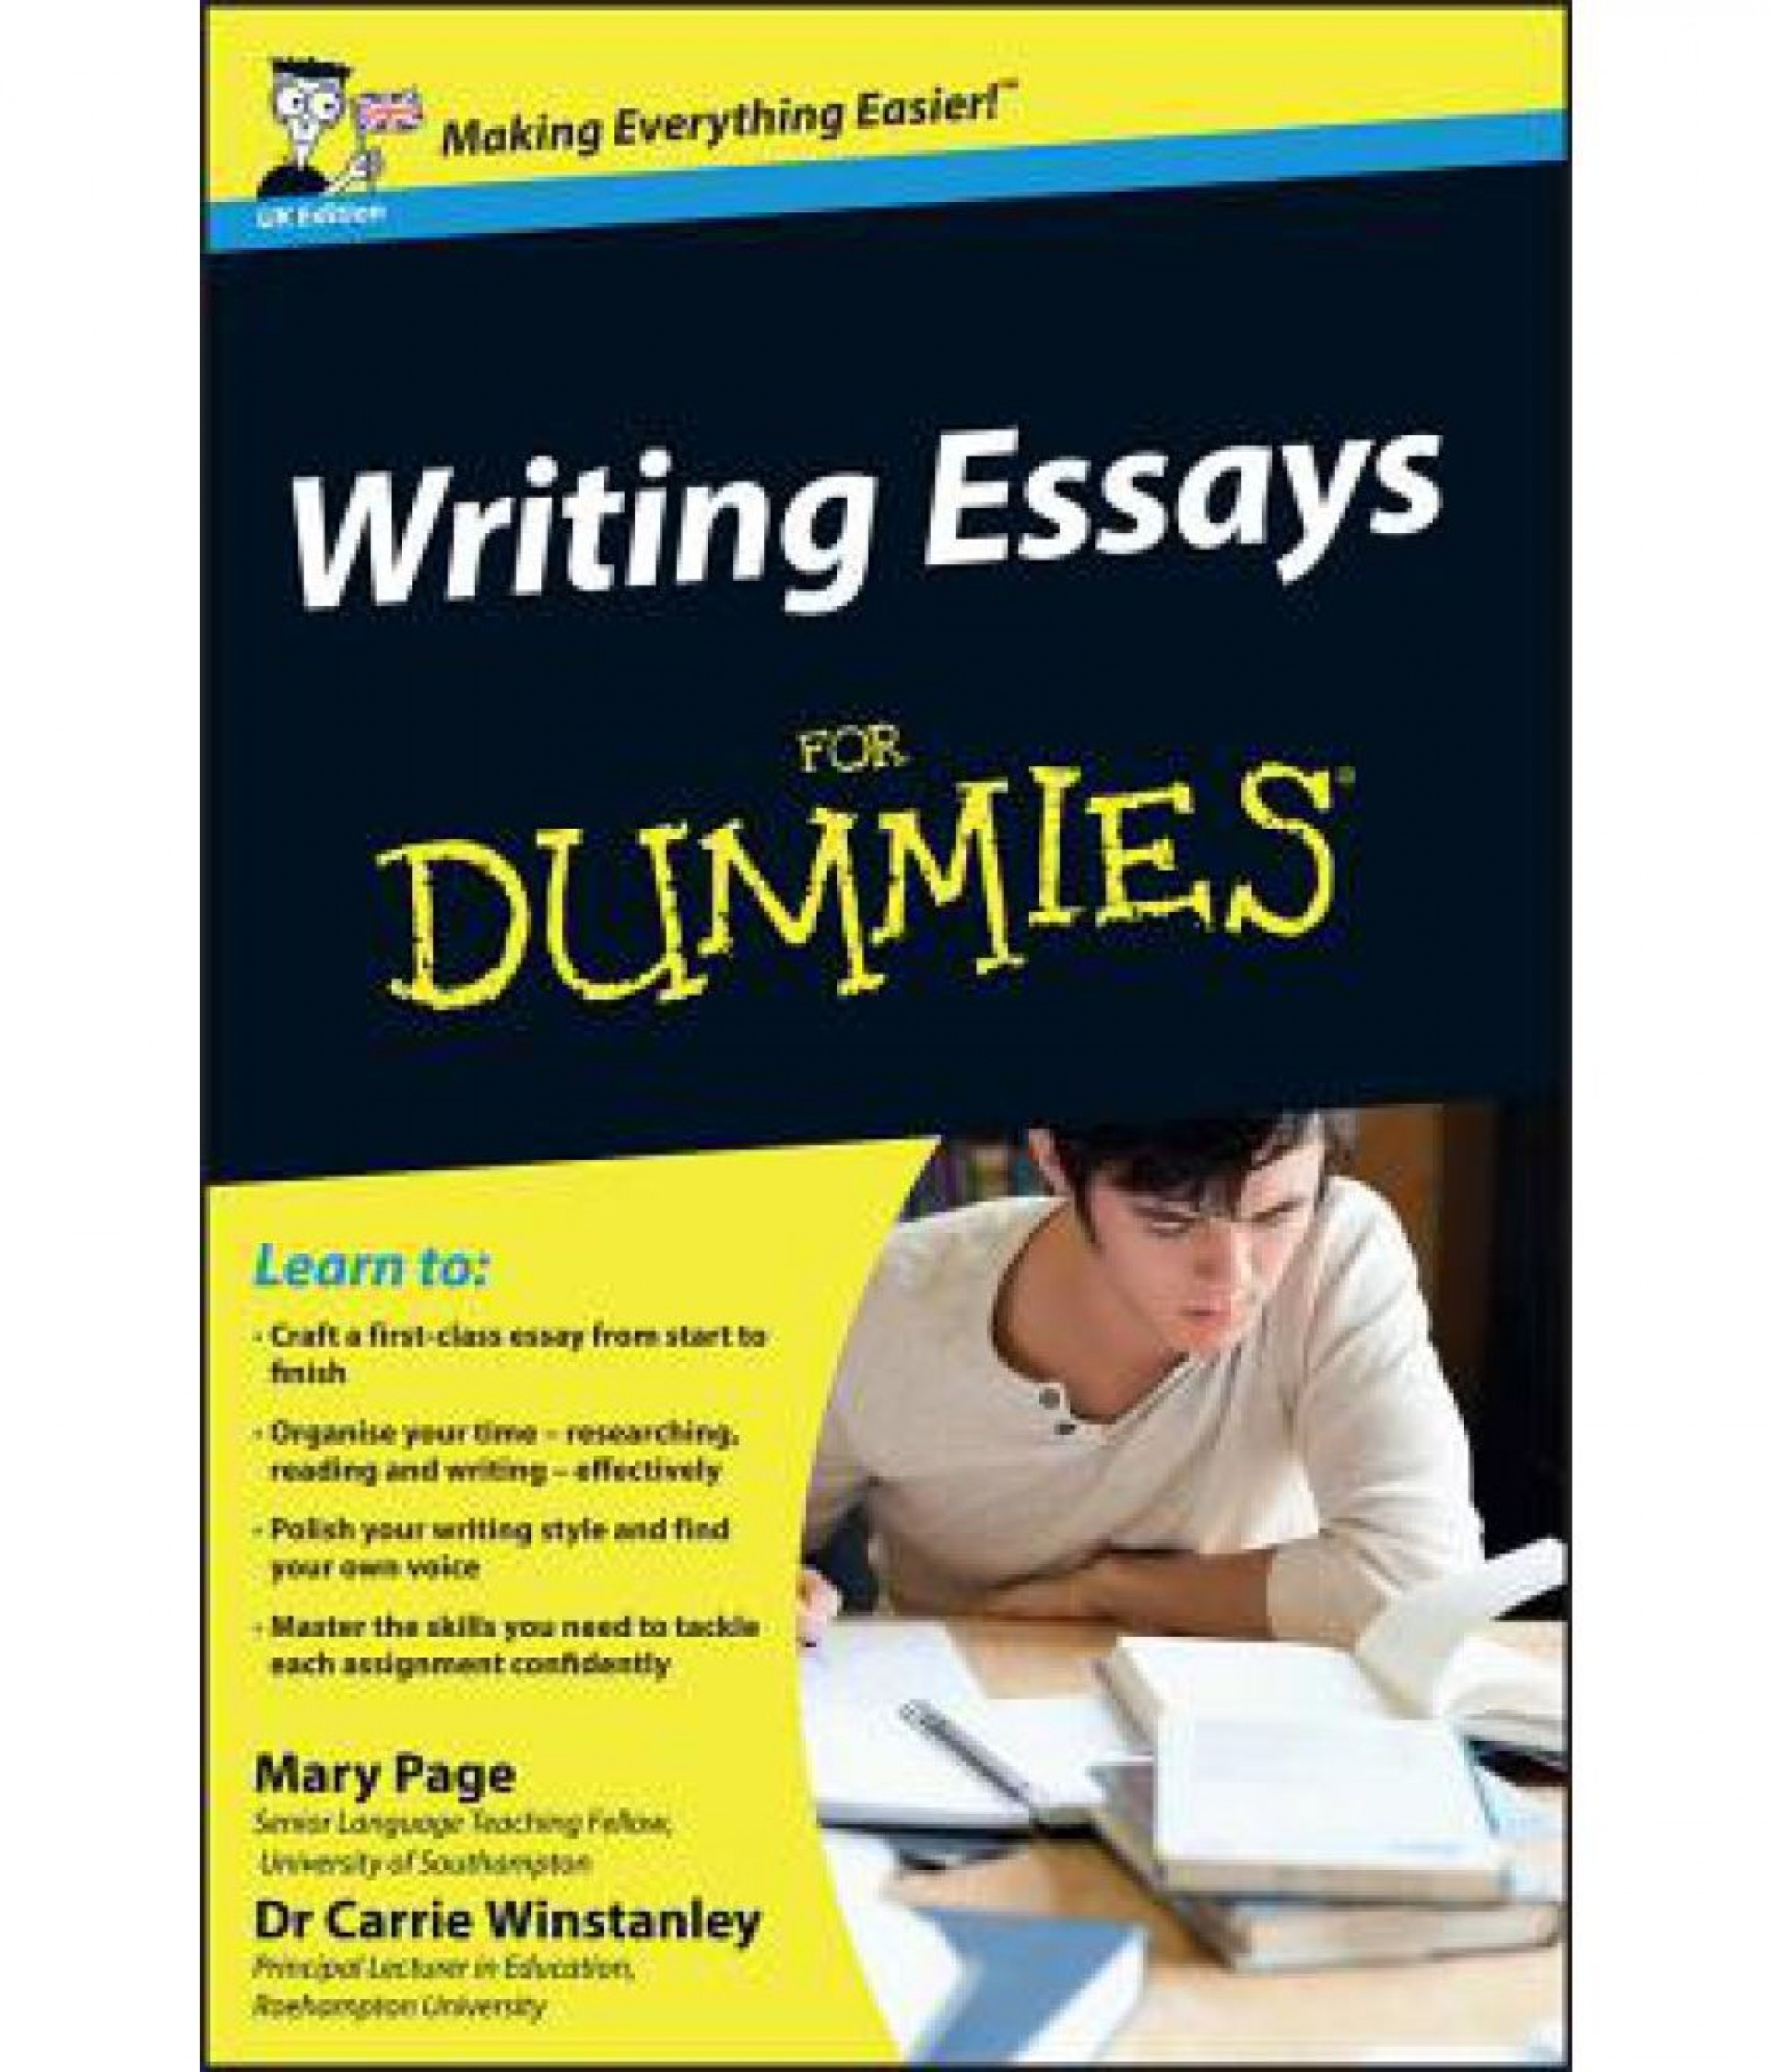 003 Writing Essays For Dummies Sdl427789710 Essay Wondrous Pdf Free Download Cheat Sheet 1920